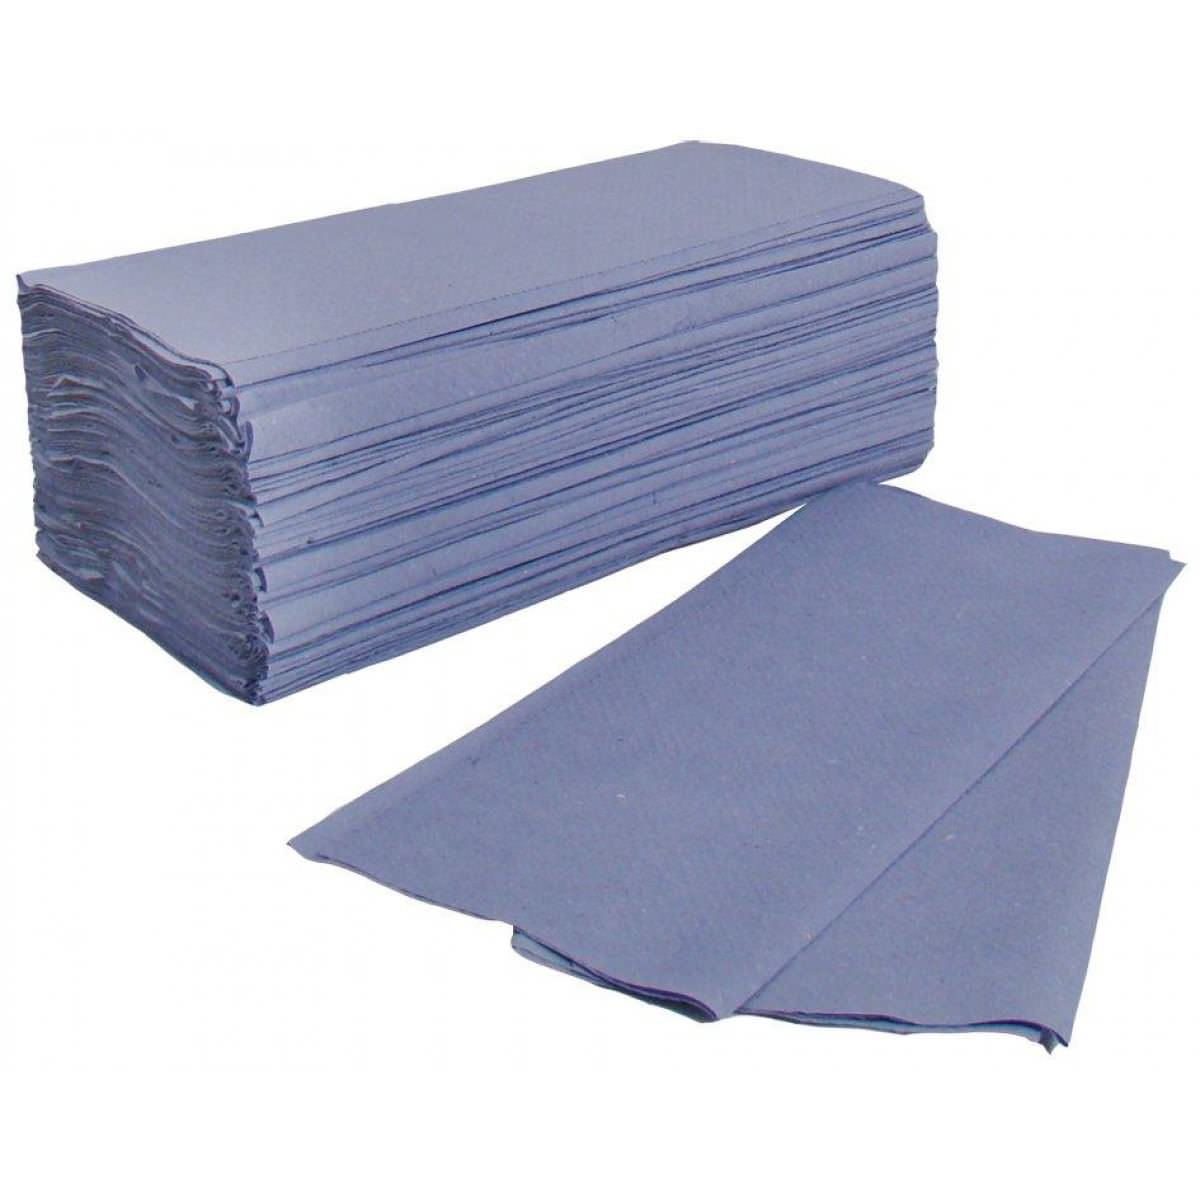 c fold hand towels sibbons. Black Bedroom Furniture Sets. Home Design Ideas